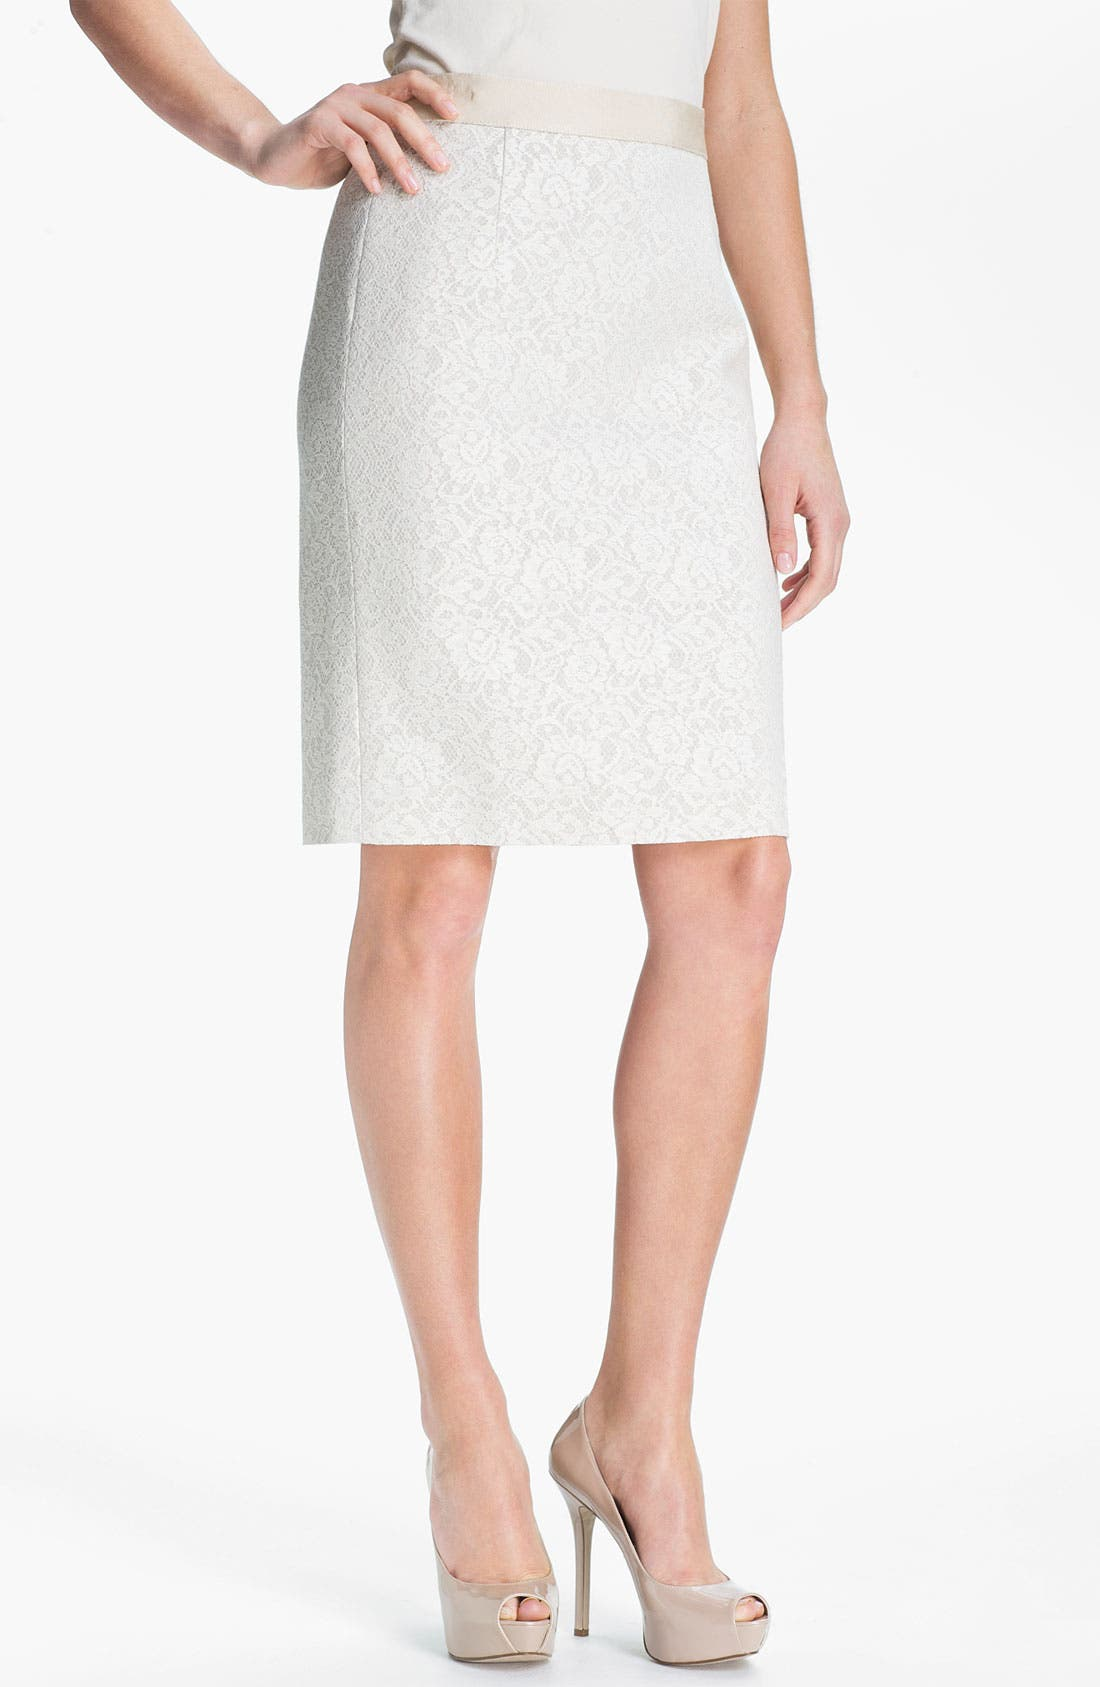 Alternate Image 1 Selected - Classiques Entier® Bonded Lace Pencil Skirt